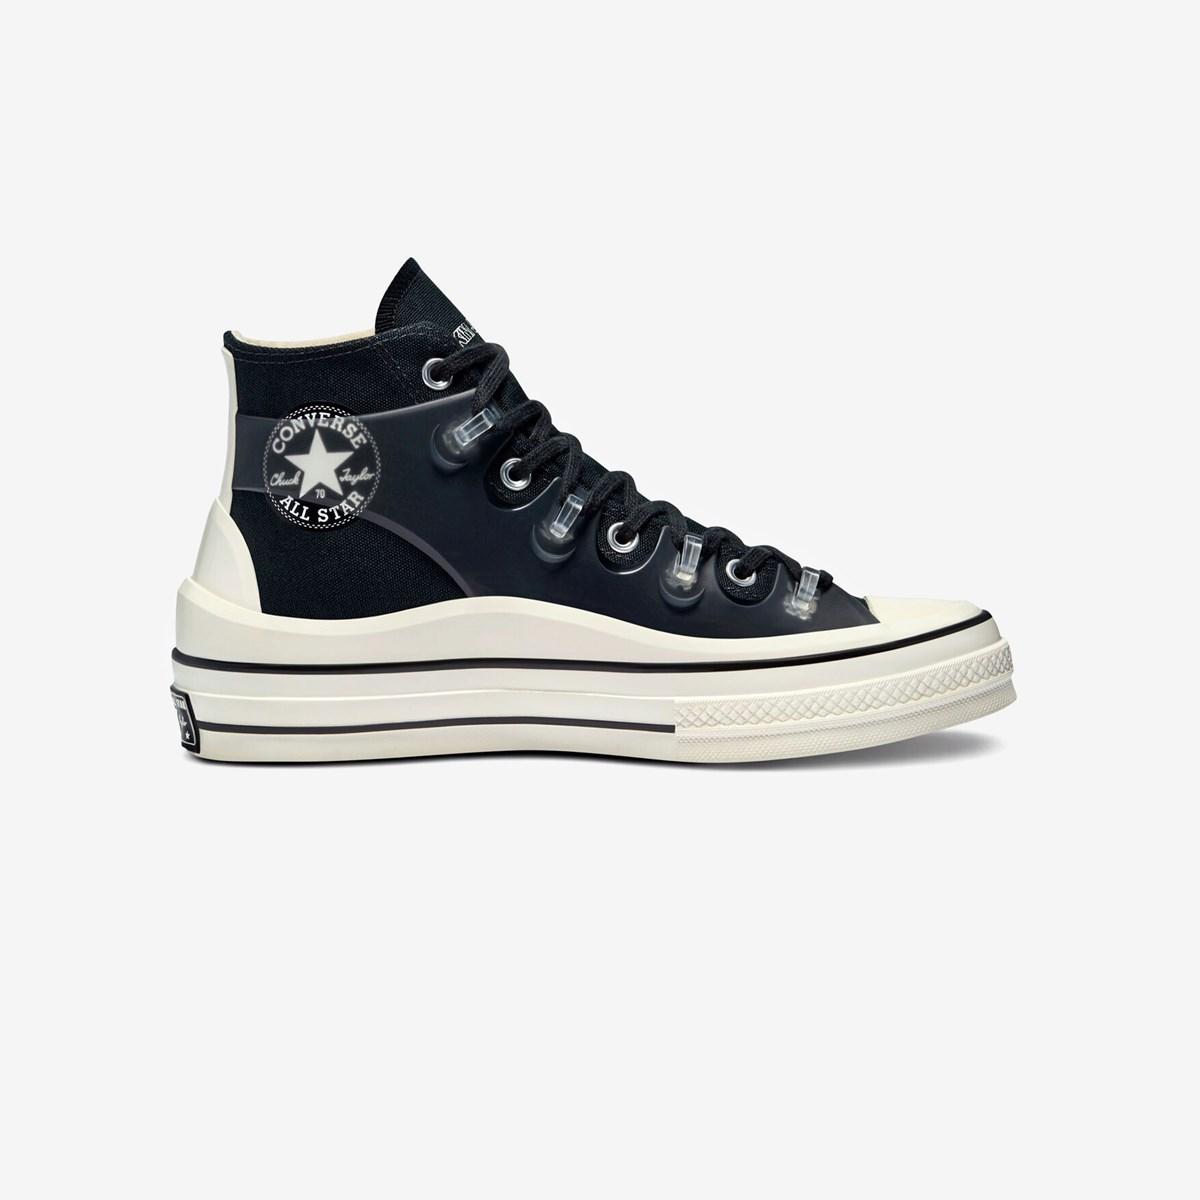 Converse Chuck 70 Utility Wave Hi x Kim Jones - 171257c - SNS | sneakers & streetwear online since 1999